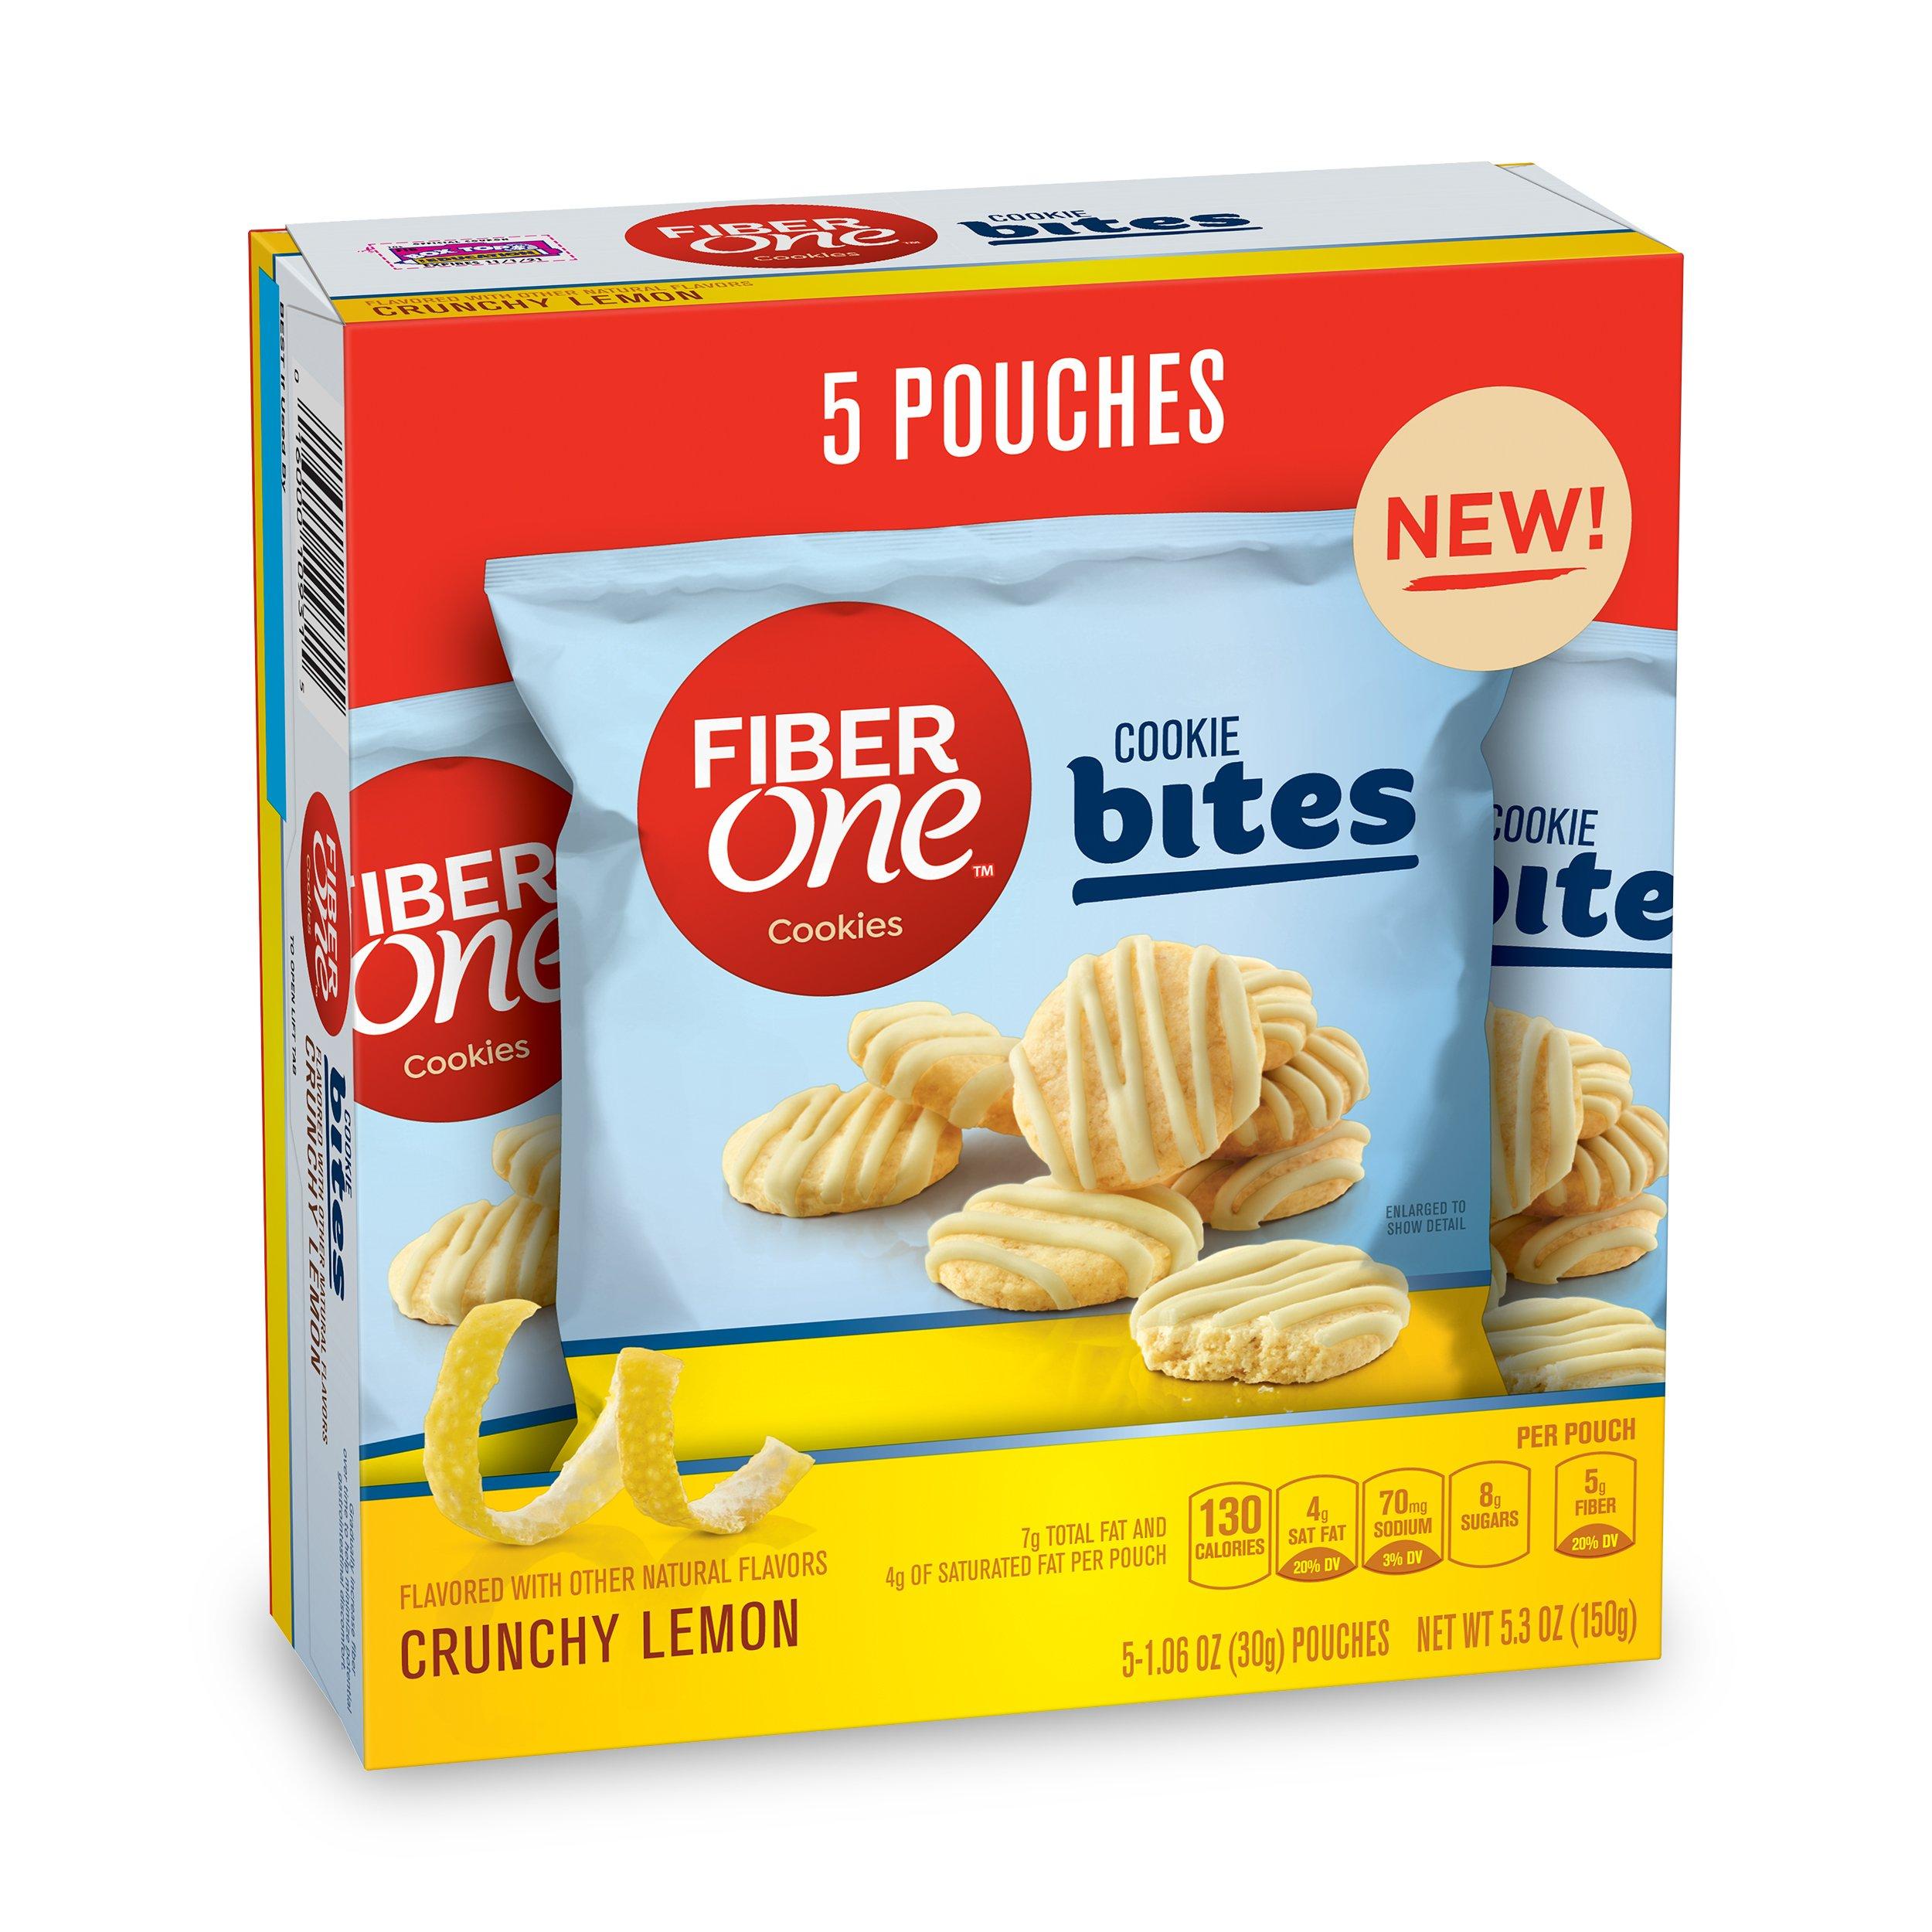 Fiber One Crunchy Lemon Cookie Bites, 5 Count (Pack of 8)